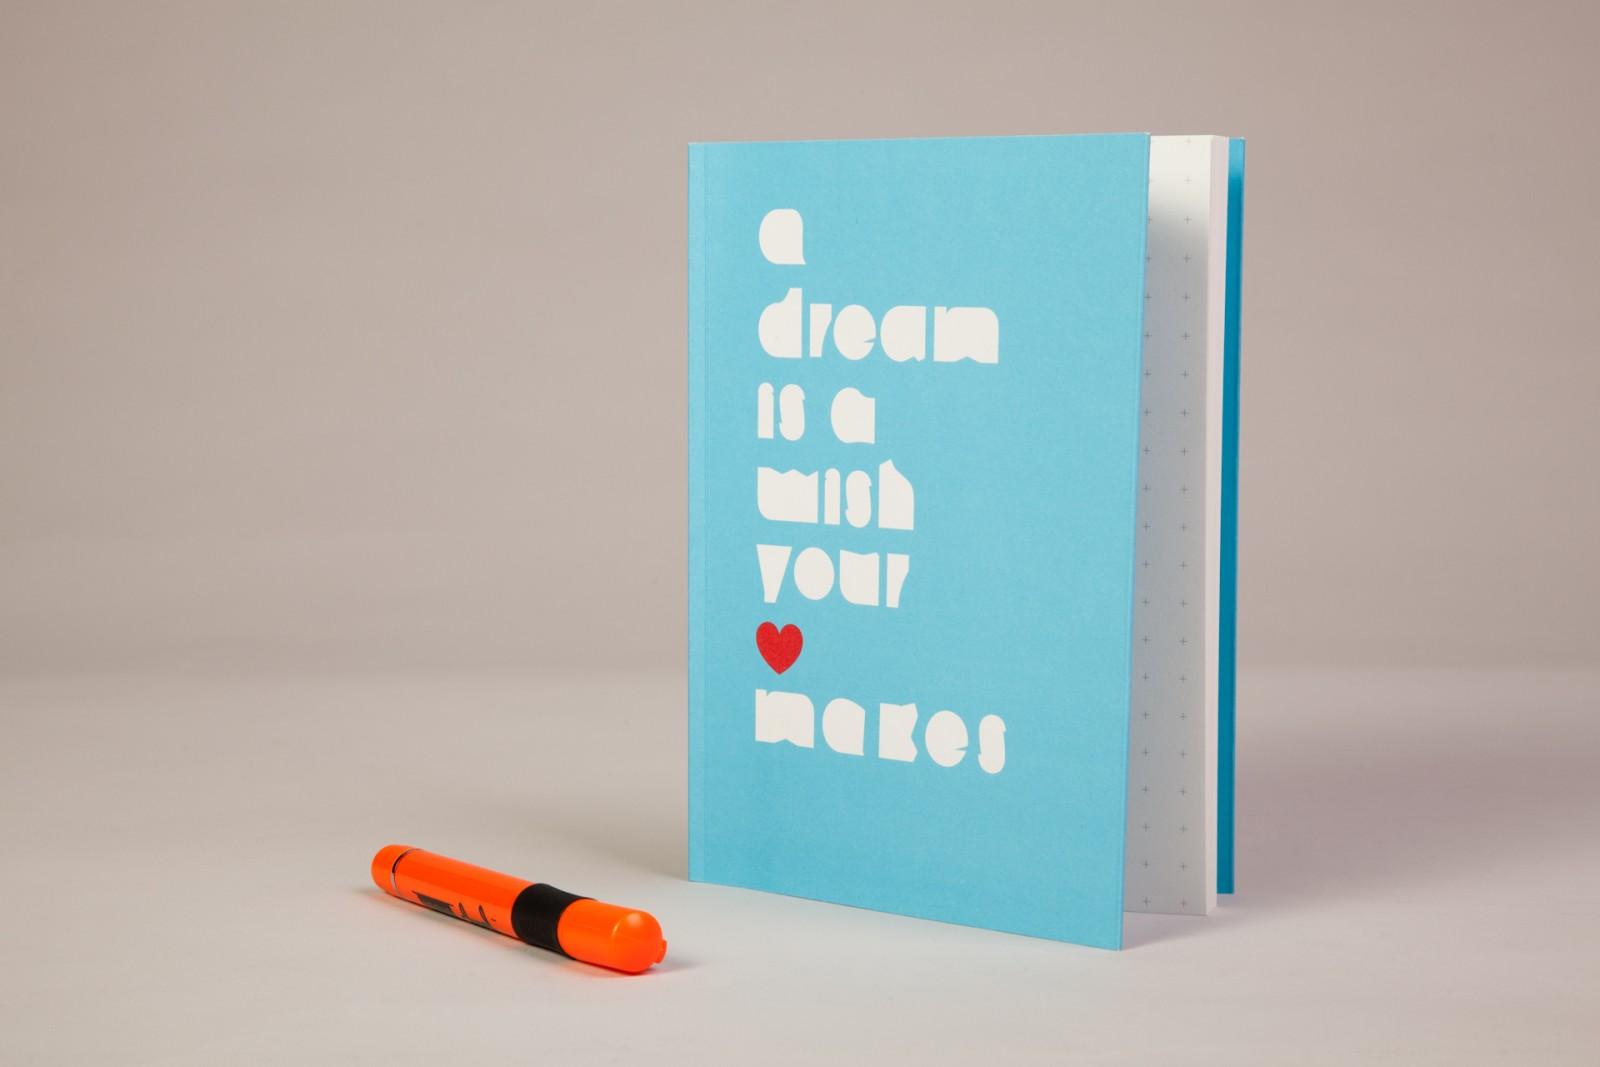 Dream Journal A Dream Is A Wish